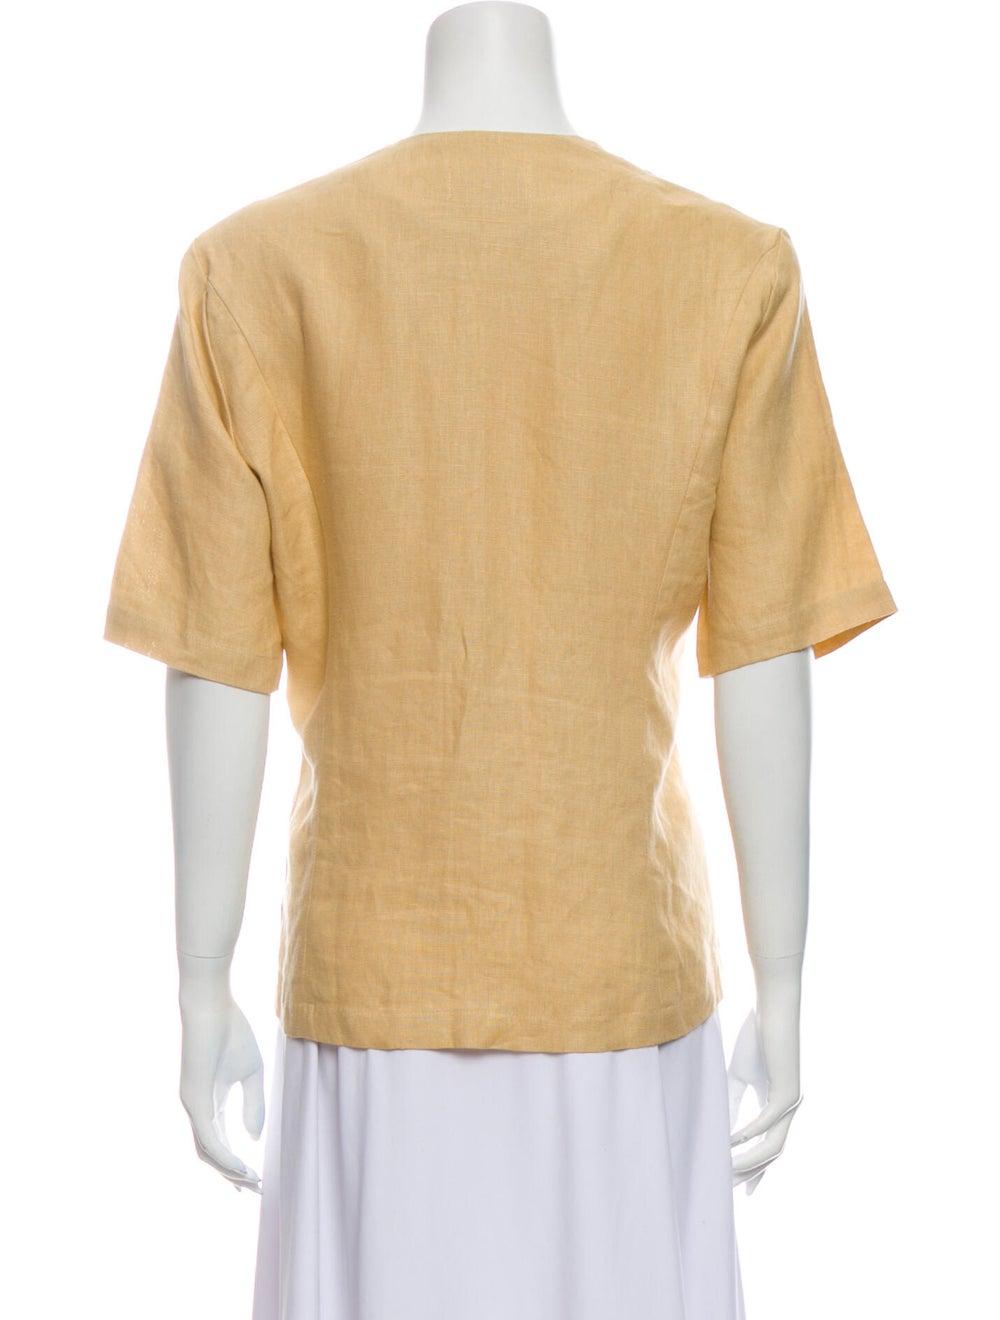 Posse Linen Jacket - image 3